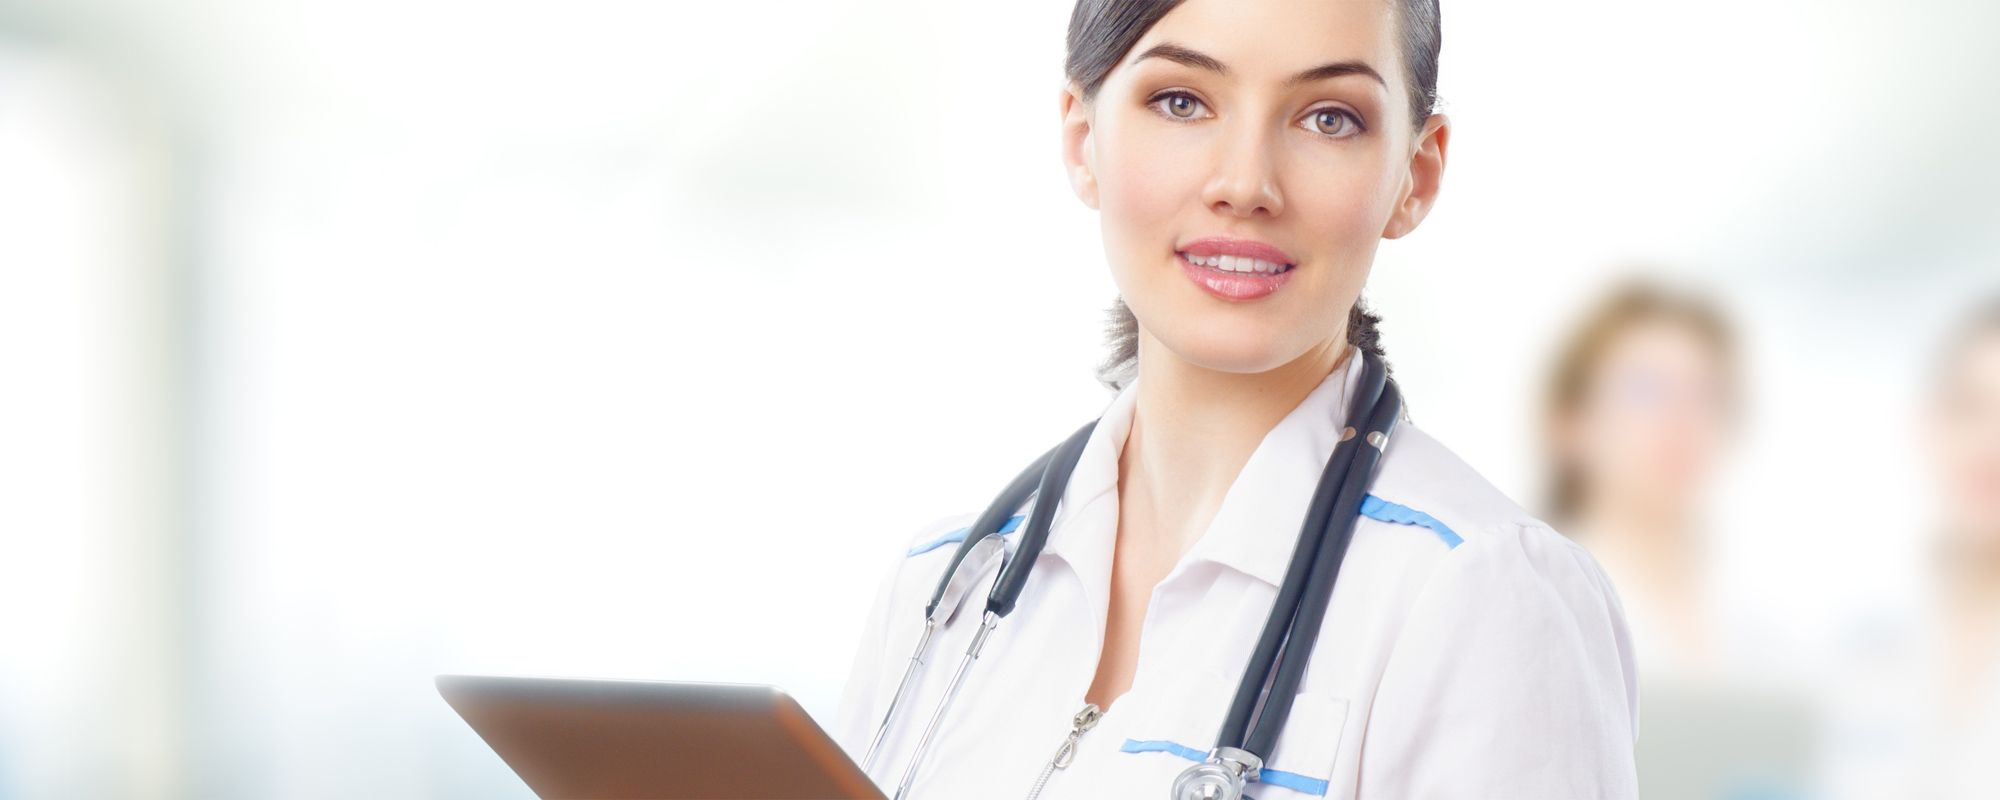 Medicijn Dokter